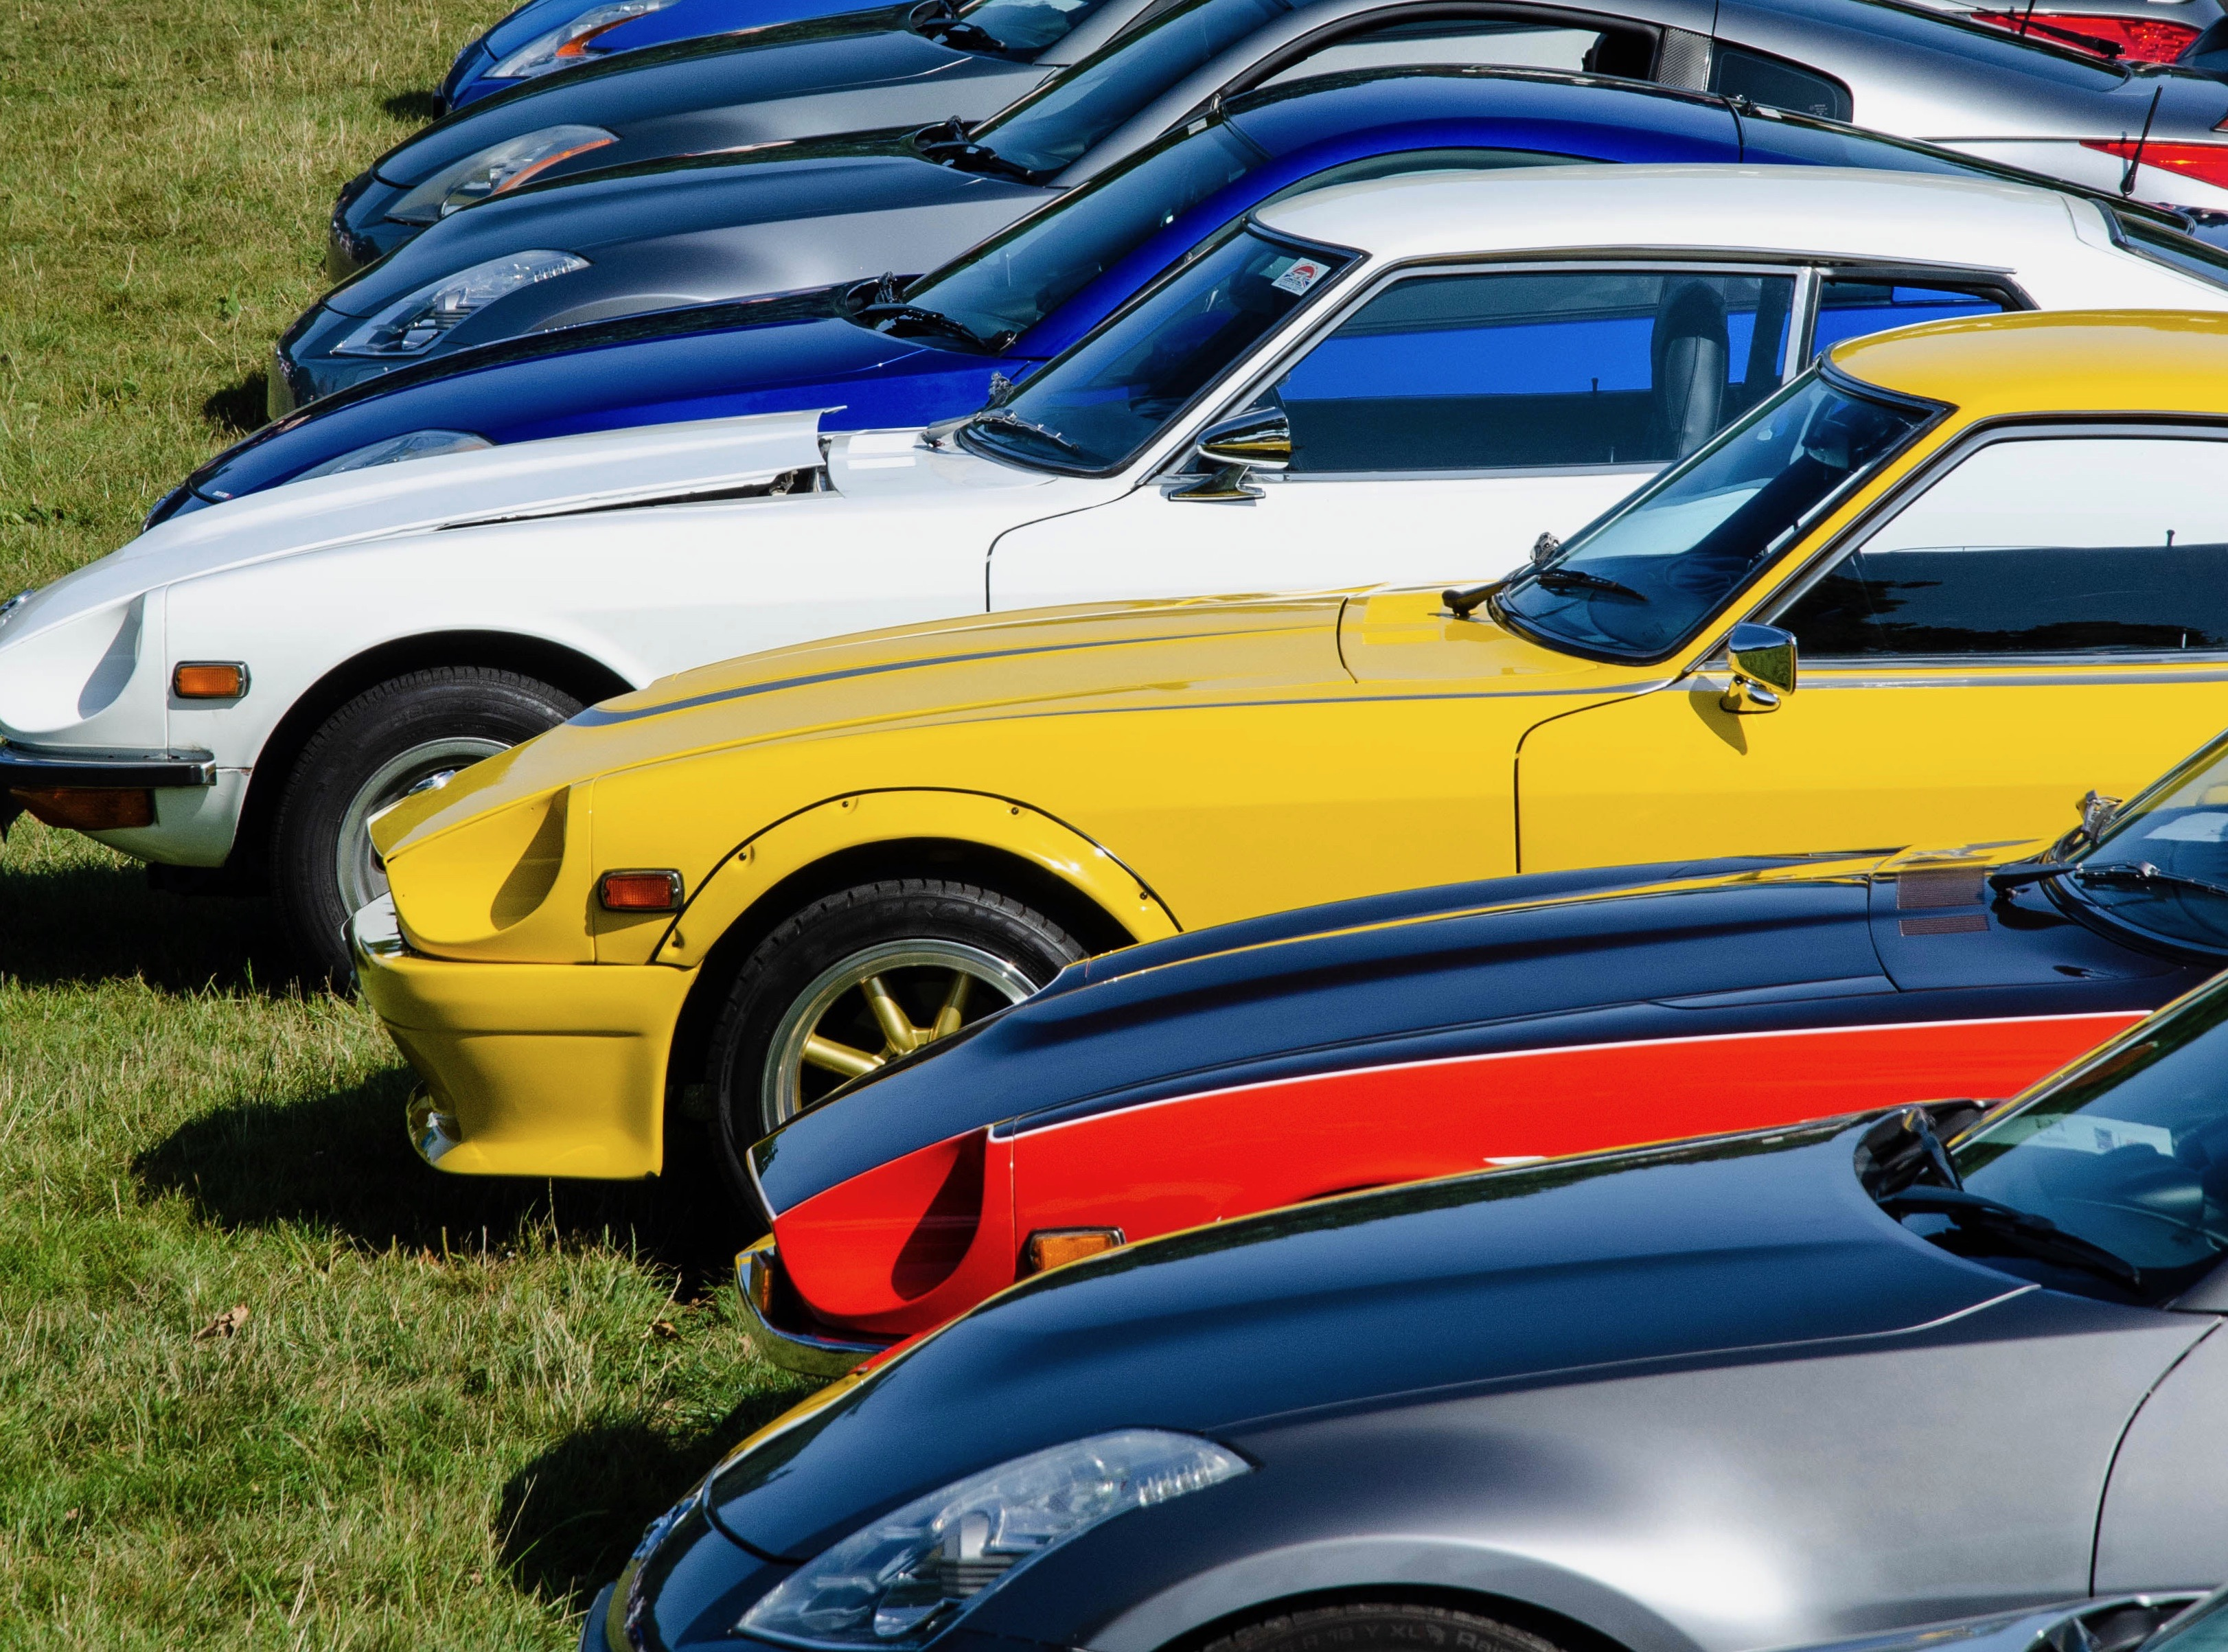 Miata, GT-R anniversaries featured at Simply Japanese car show